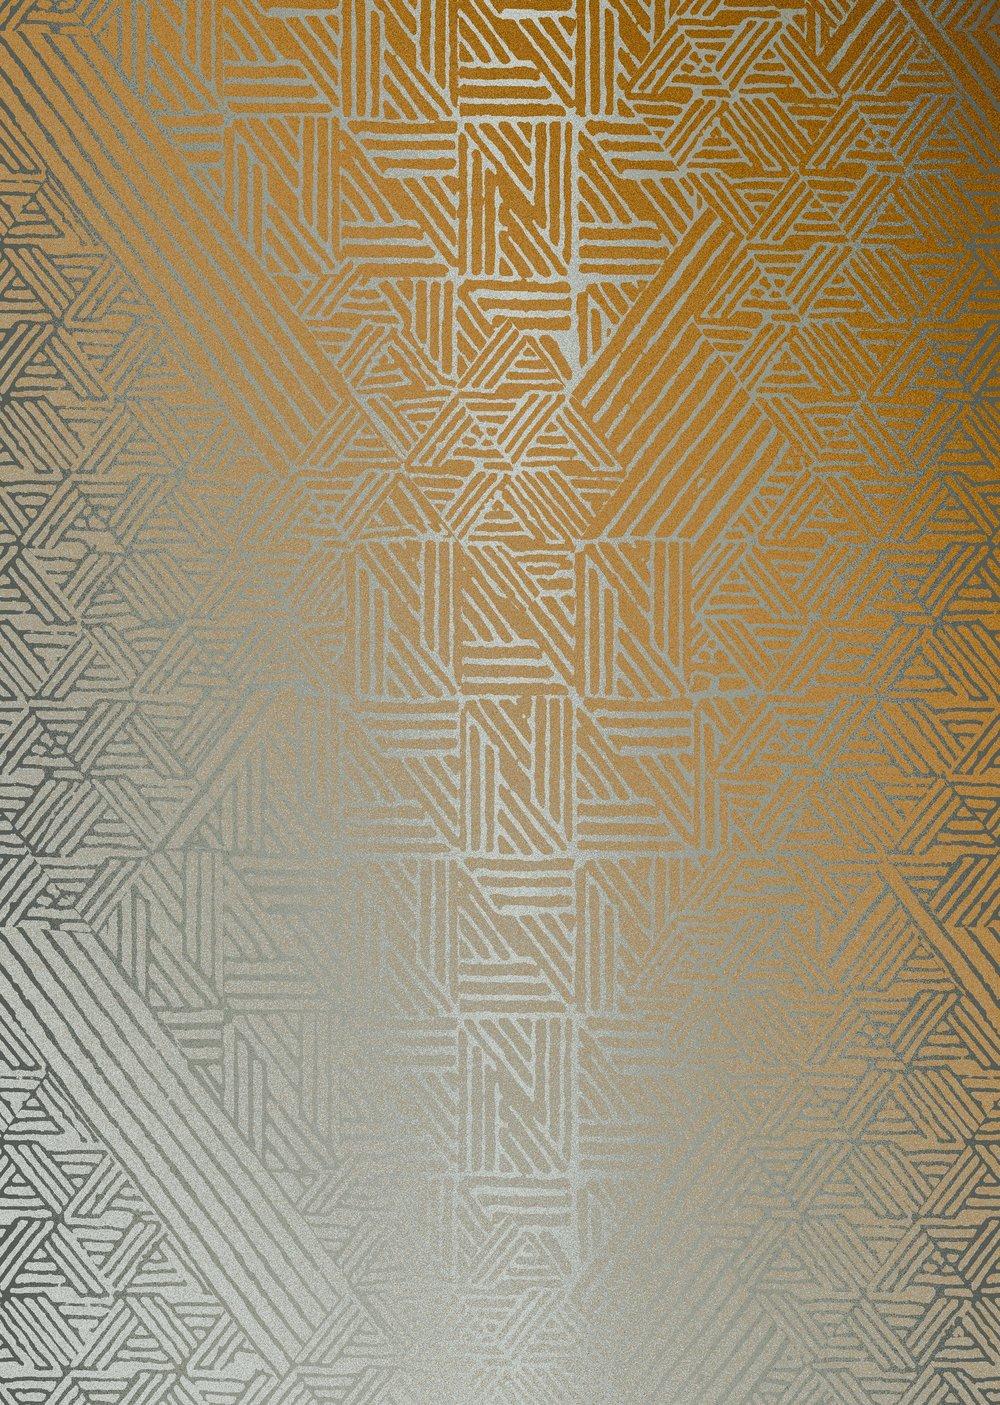 Royal Thai Design no. NXL038234-1